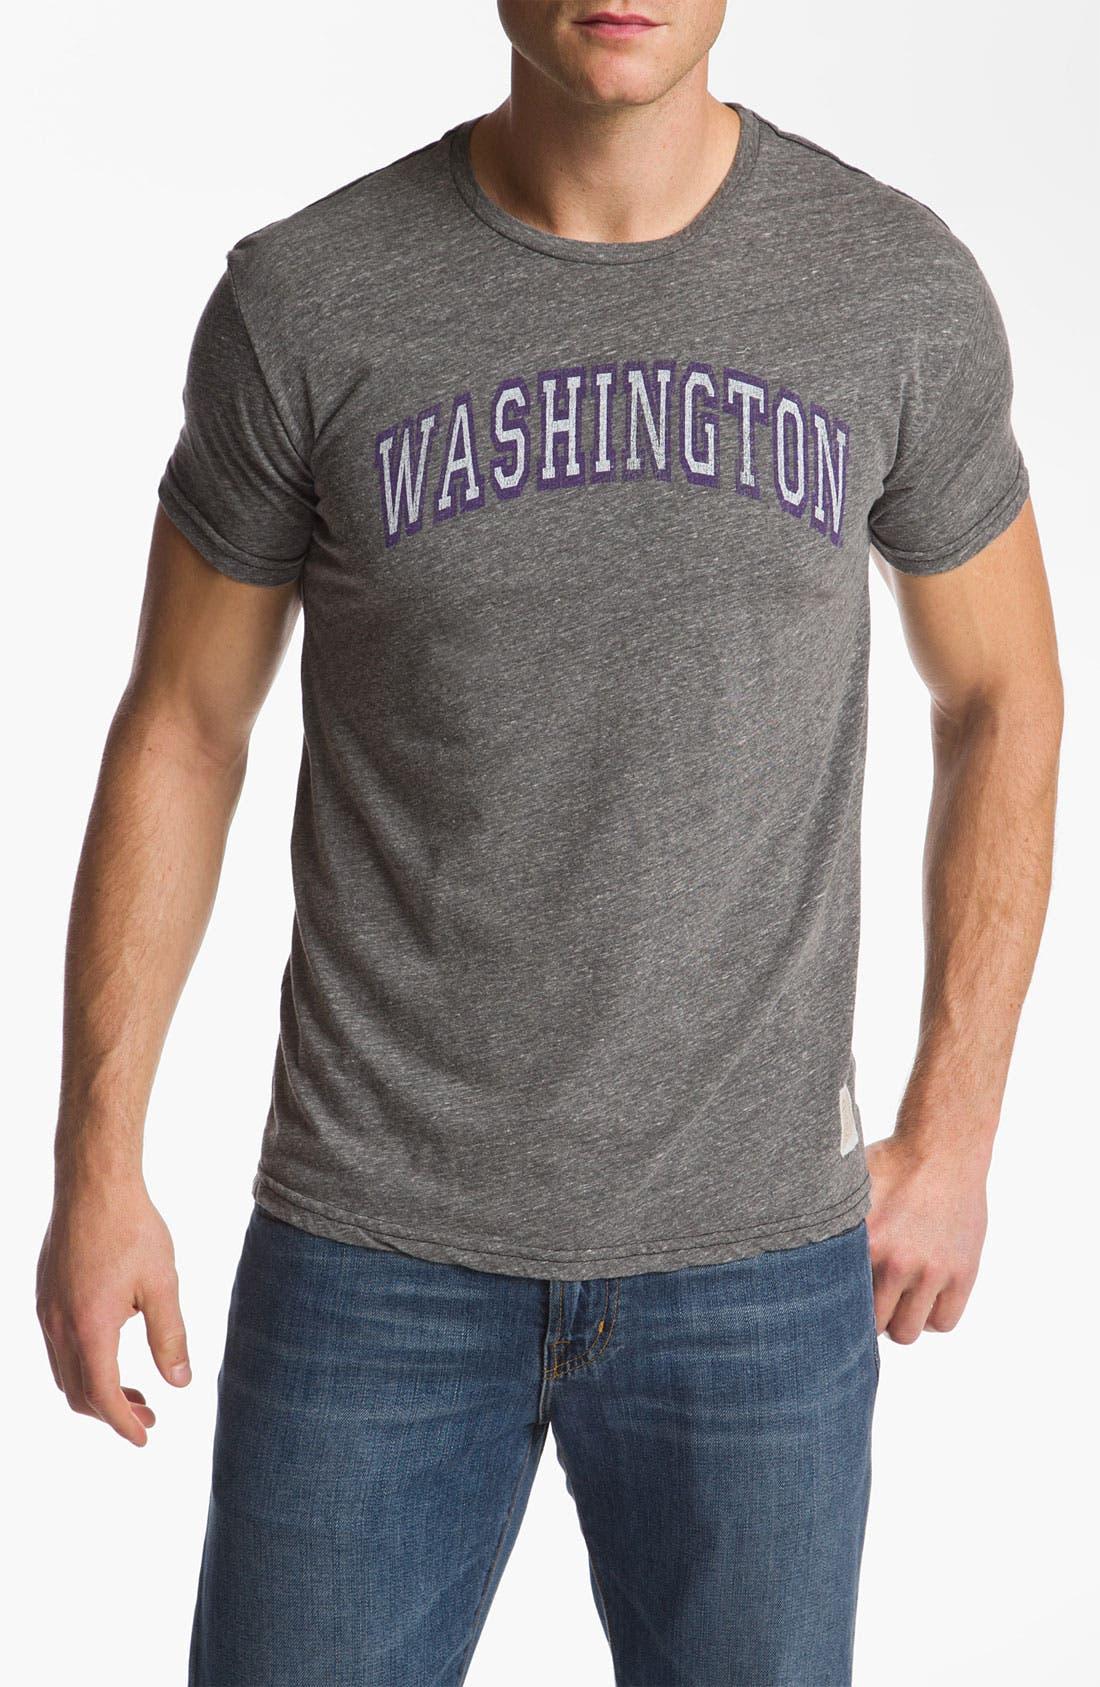 Alternate Image 1 Selected - The Original Retro Brand 'University of Washington Huskies' T-Shirt